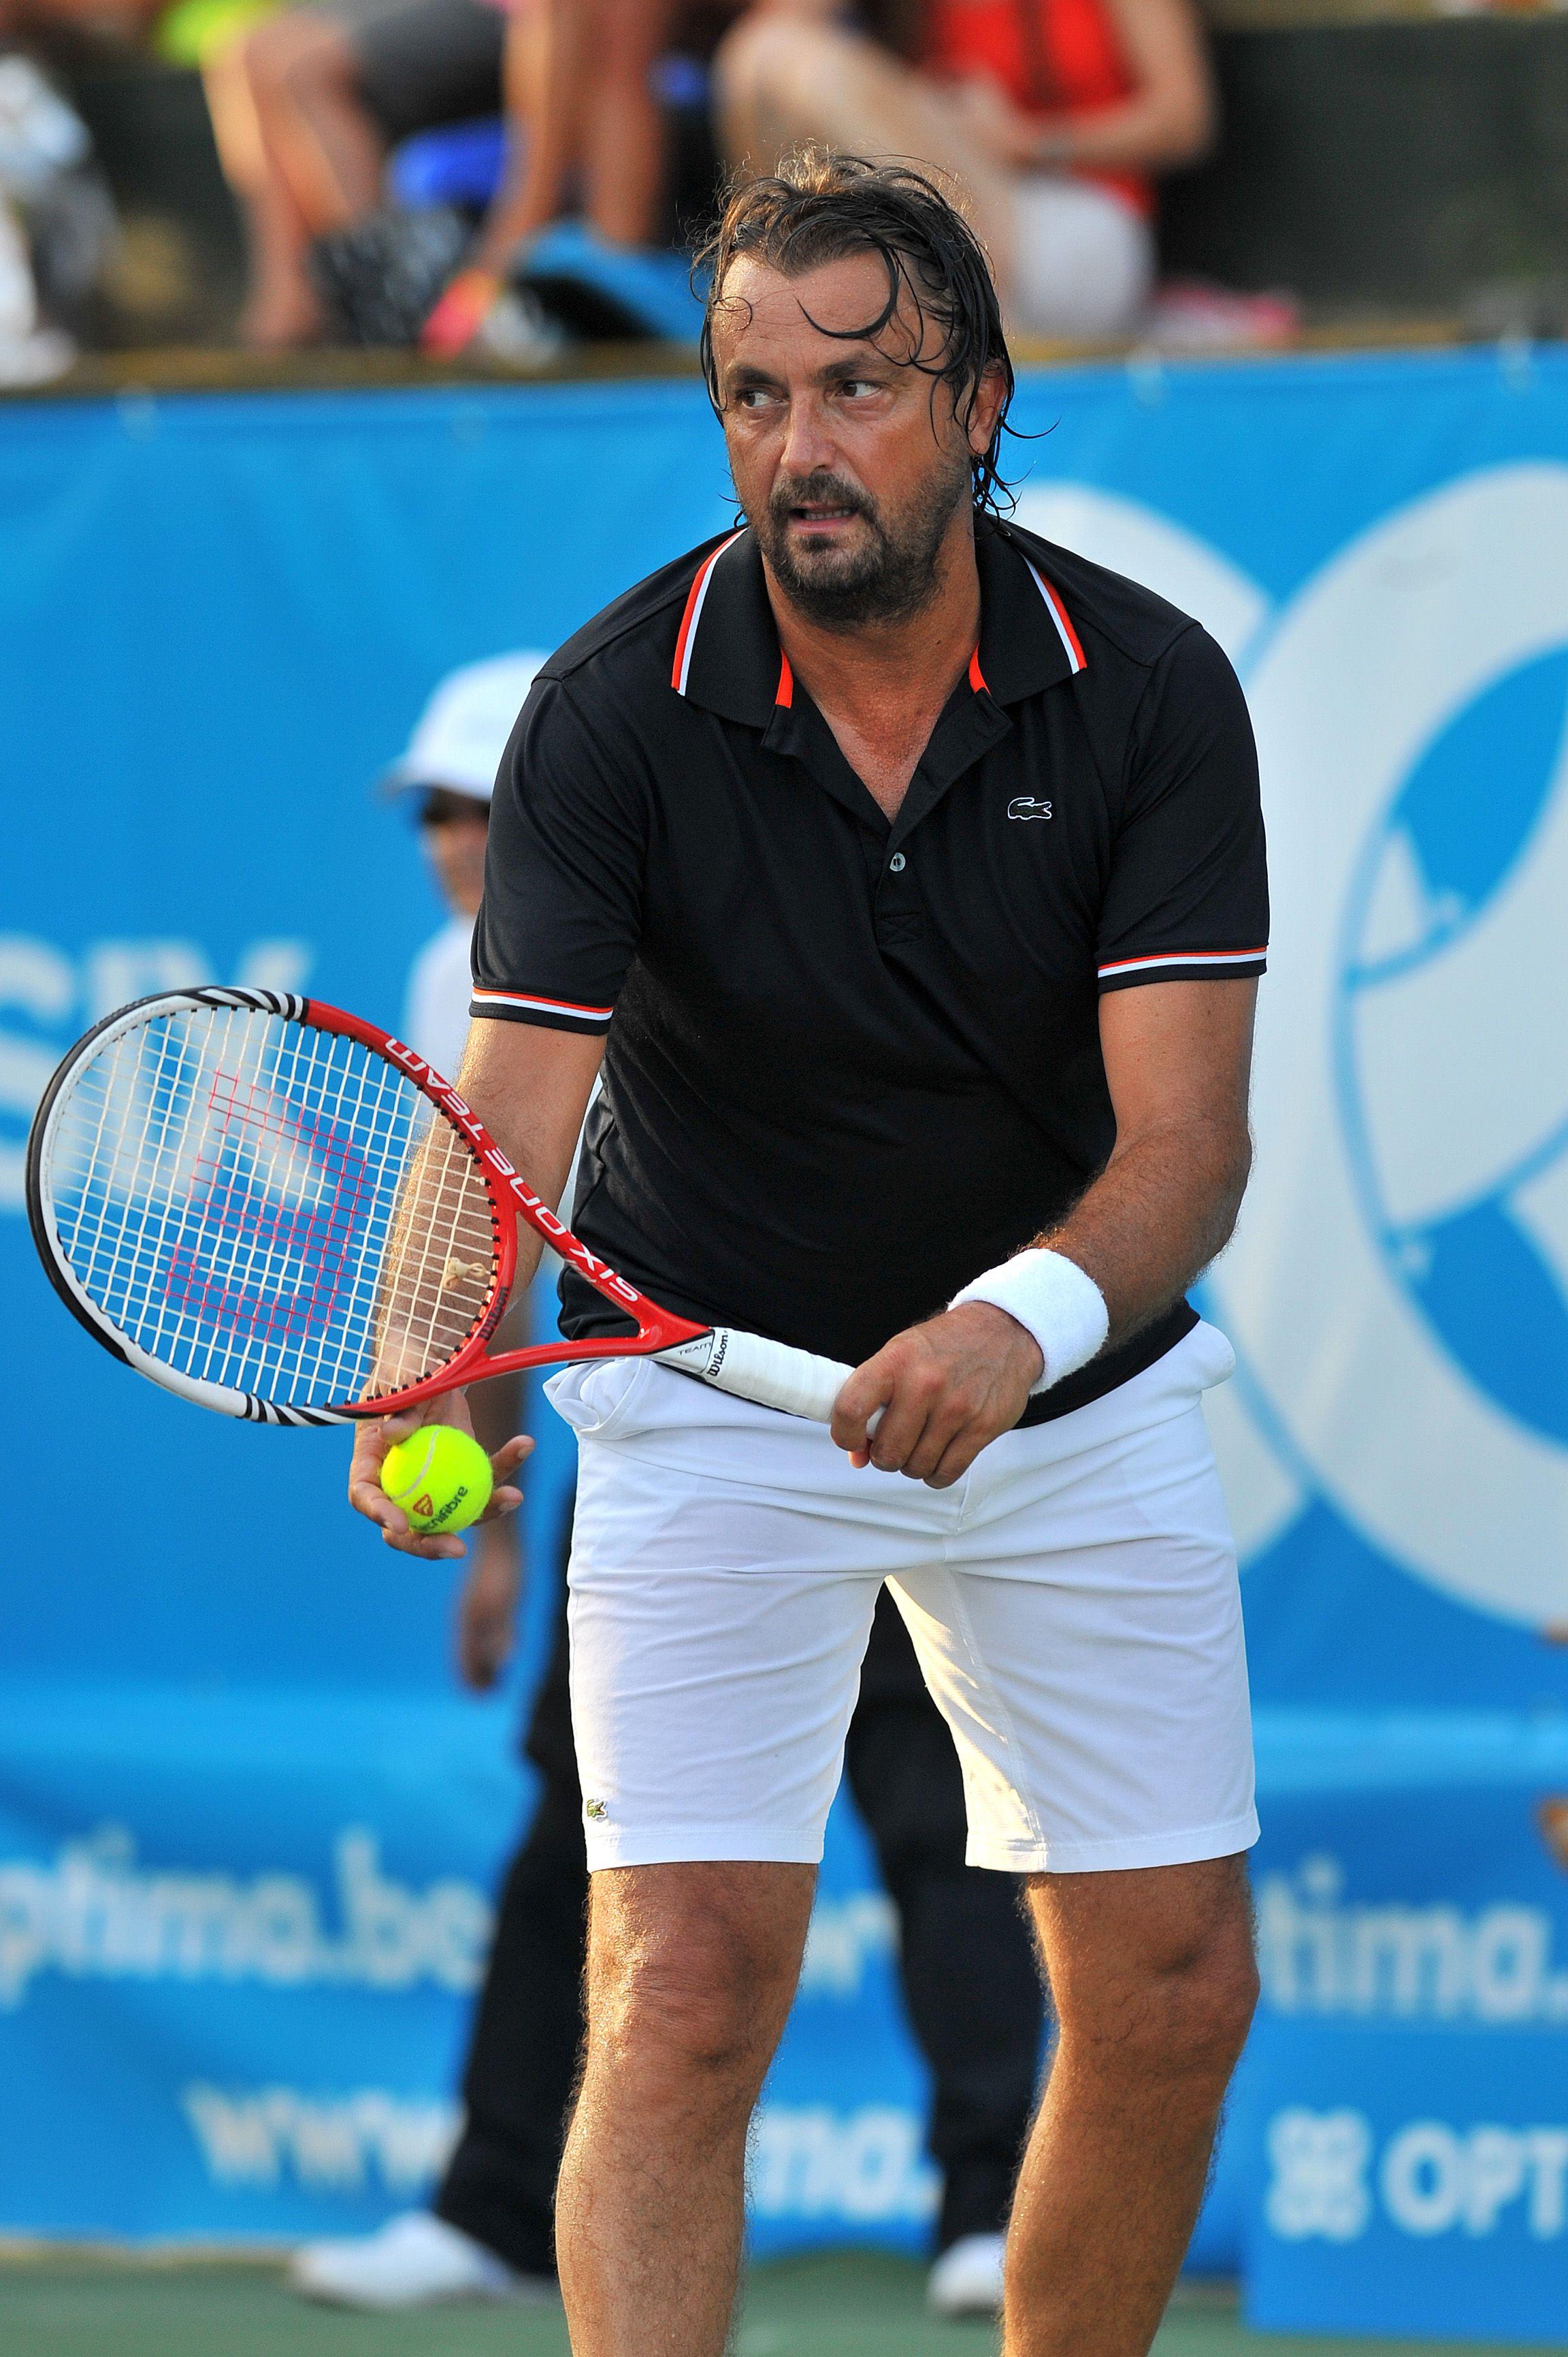 Henri Leconte at Optima Open 2012 | Tennis players, Tennis